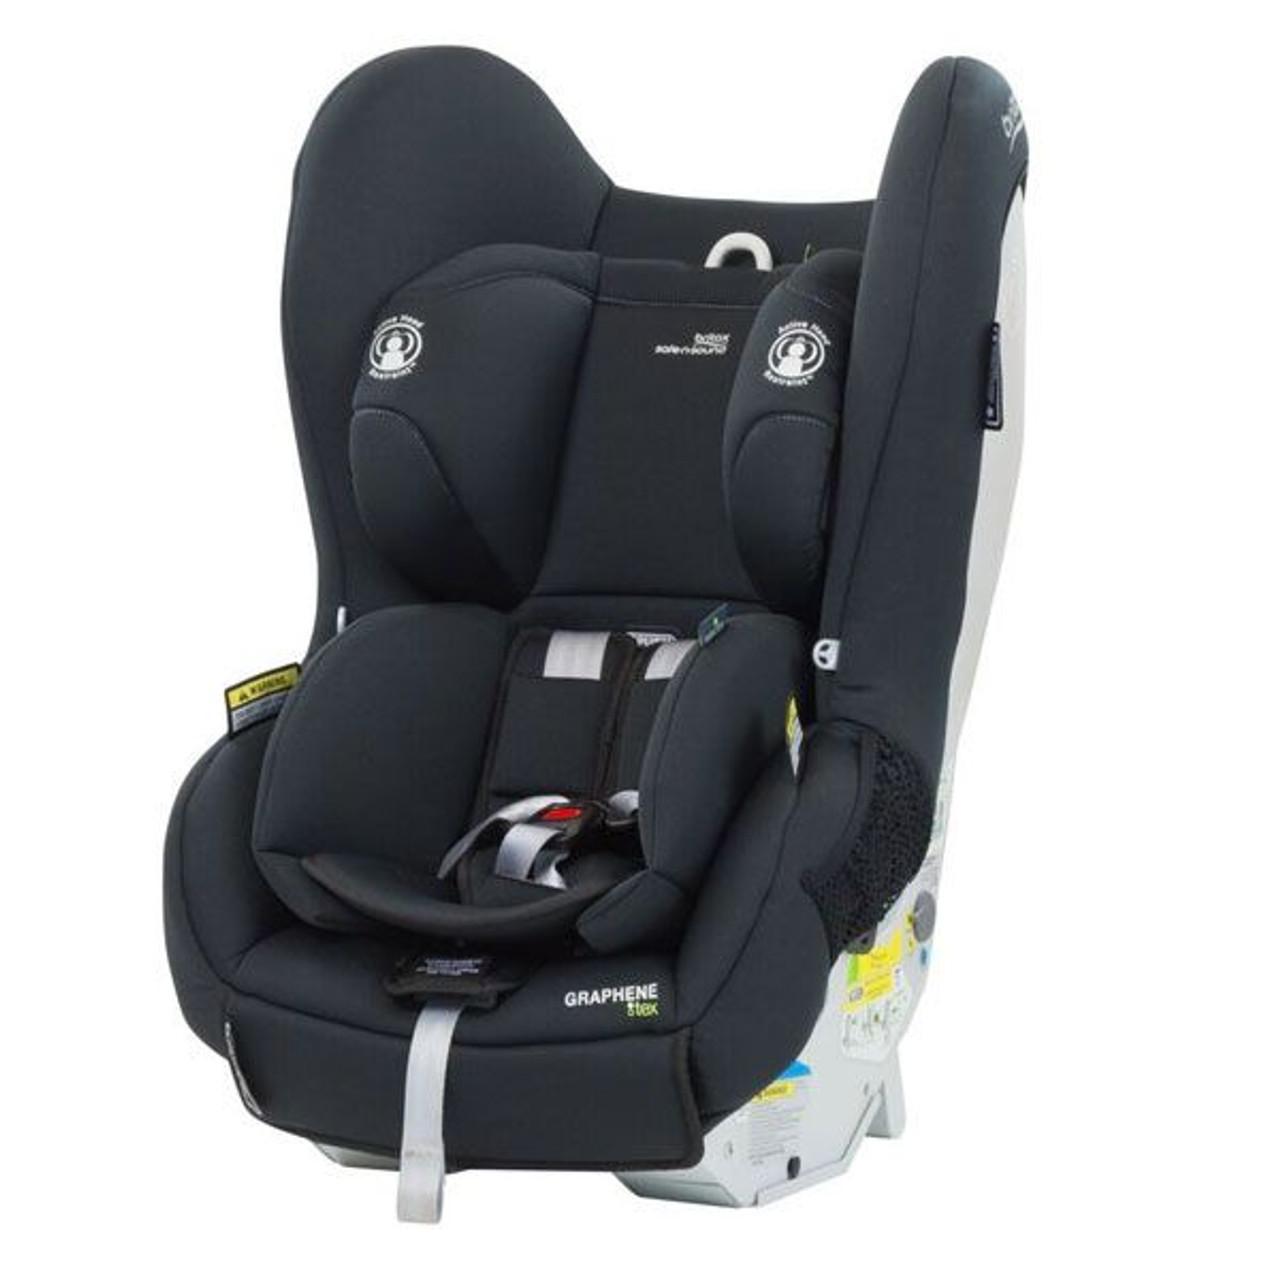 Britax Safe n Sound GrapheneTEX Convertible Car Seat ISOFIX Black